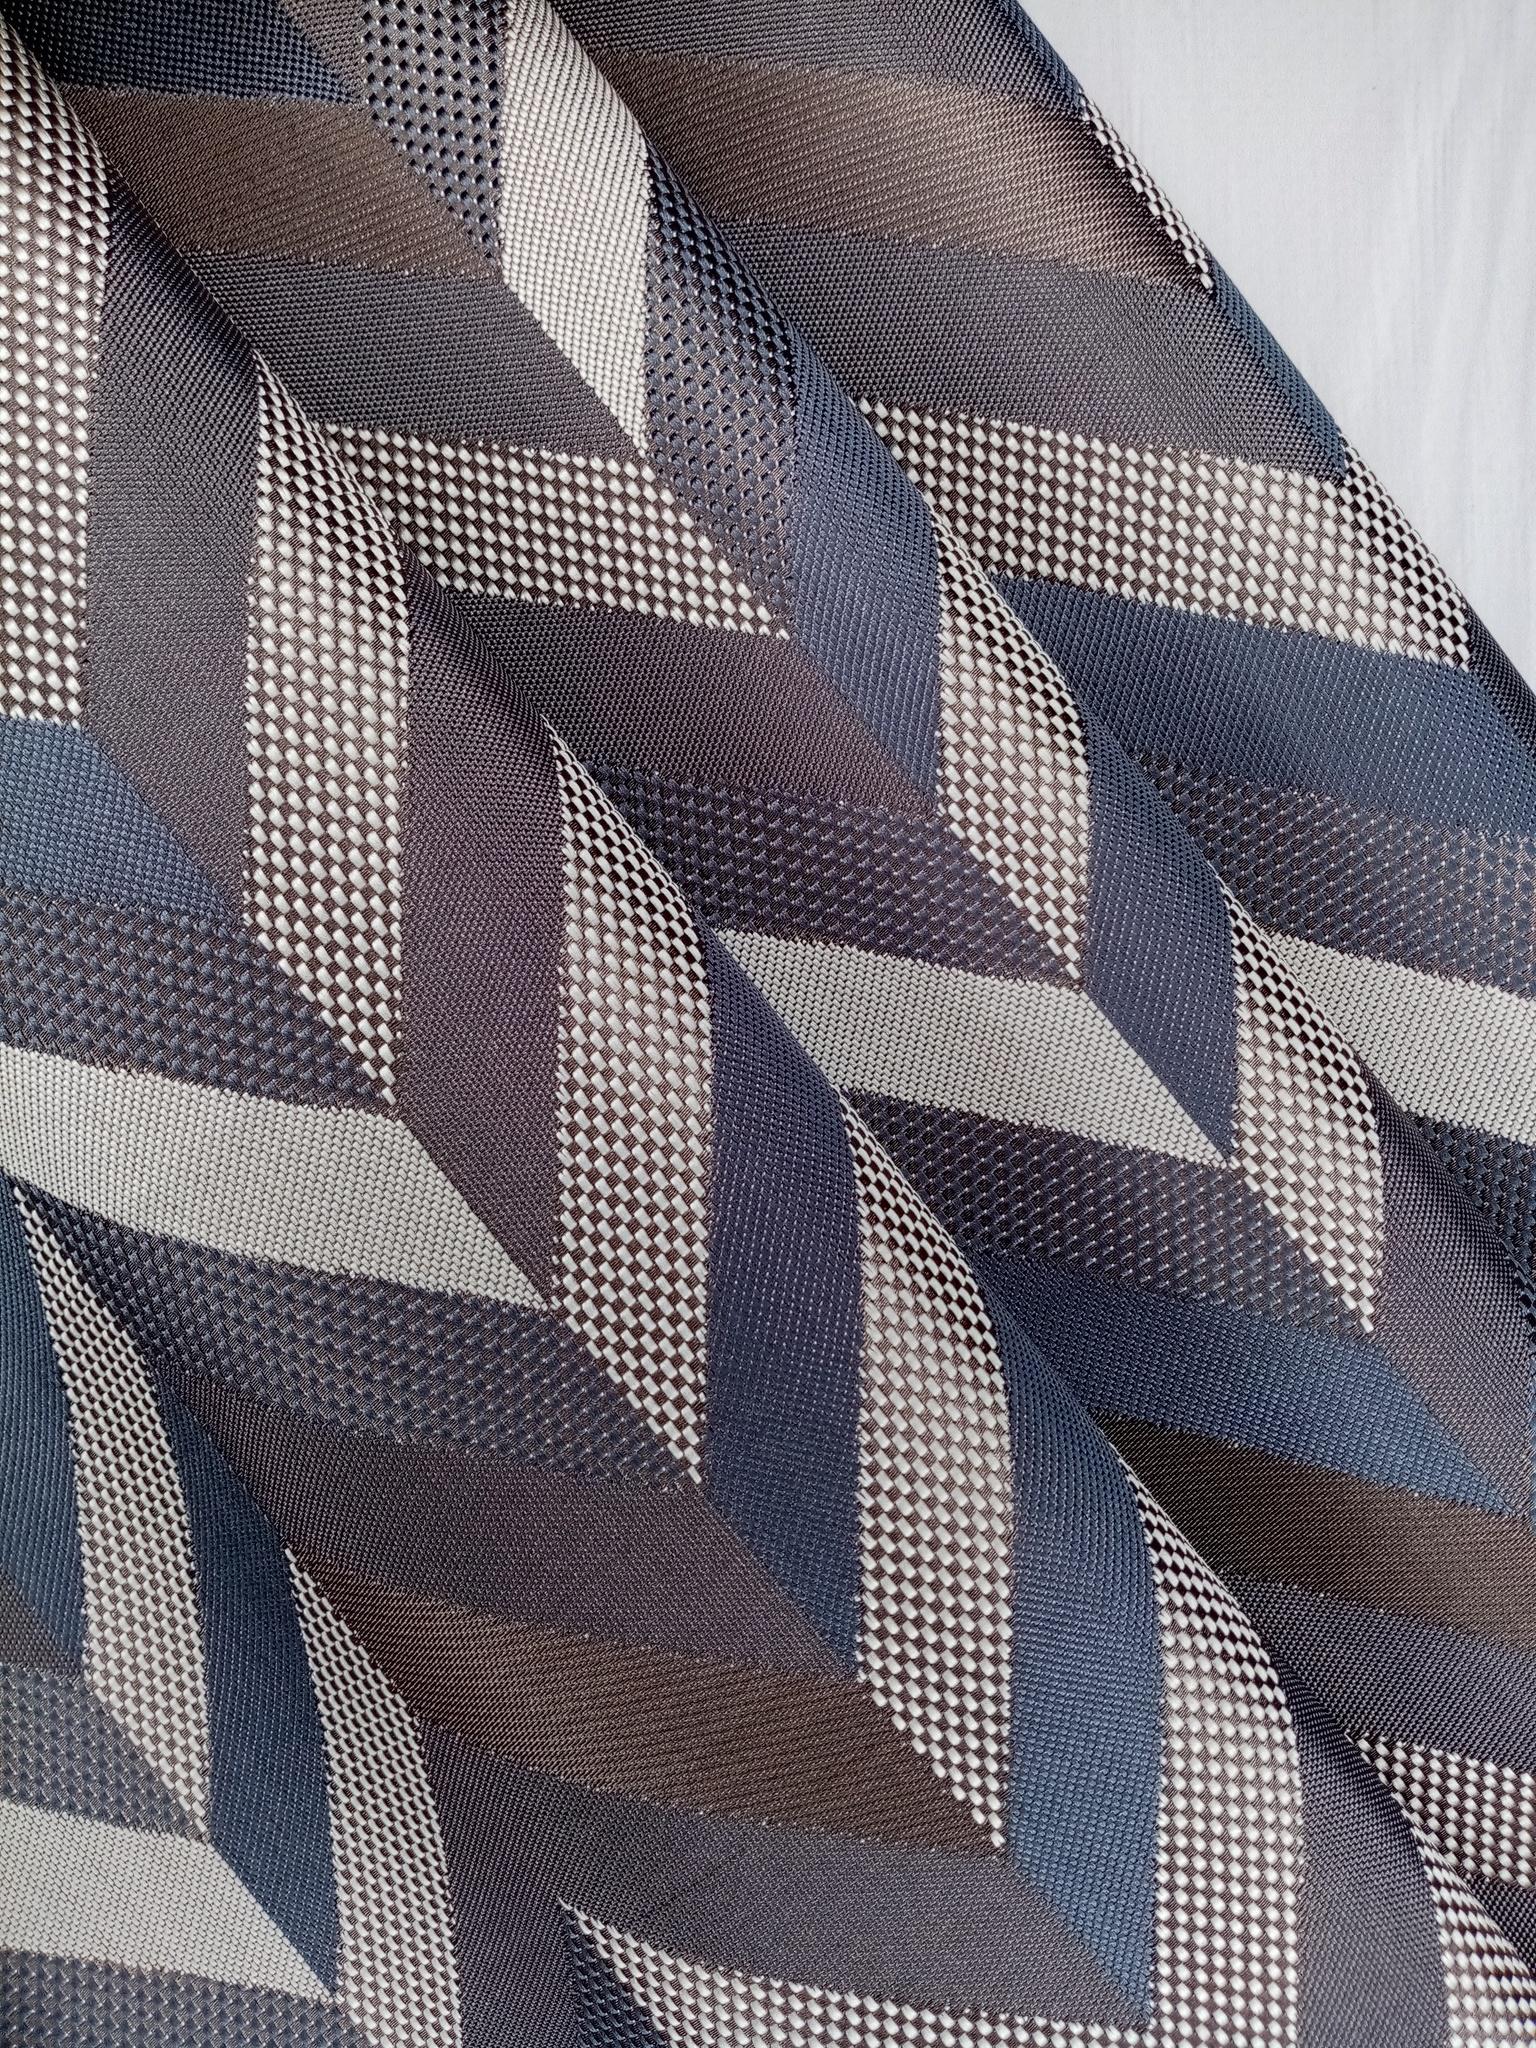 Ткань для портьер шеврон меланжевый компаньон